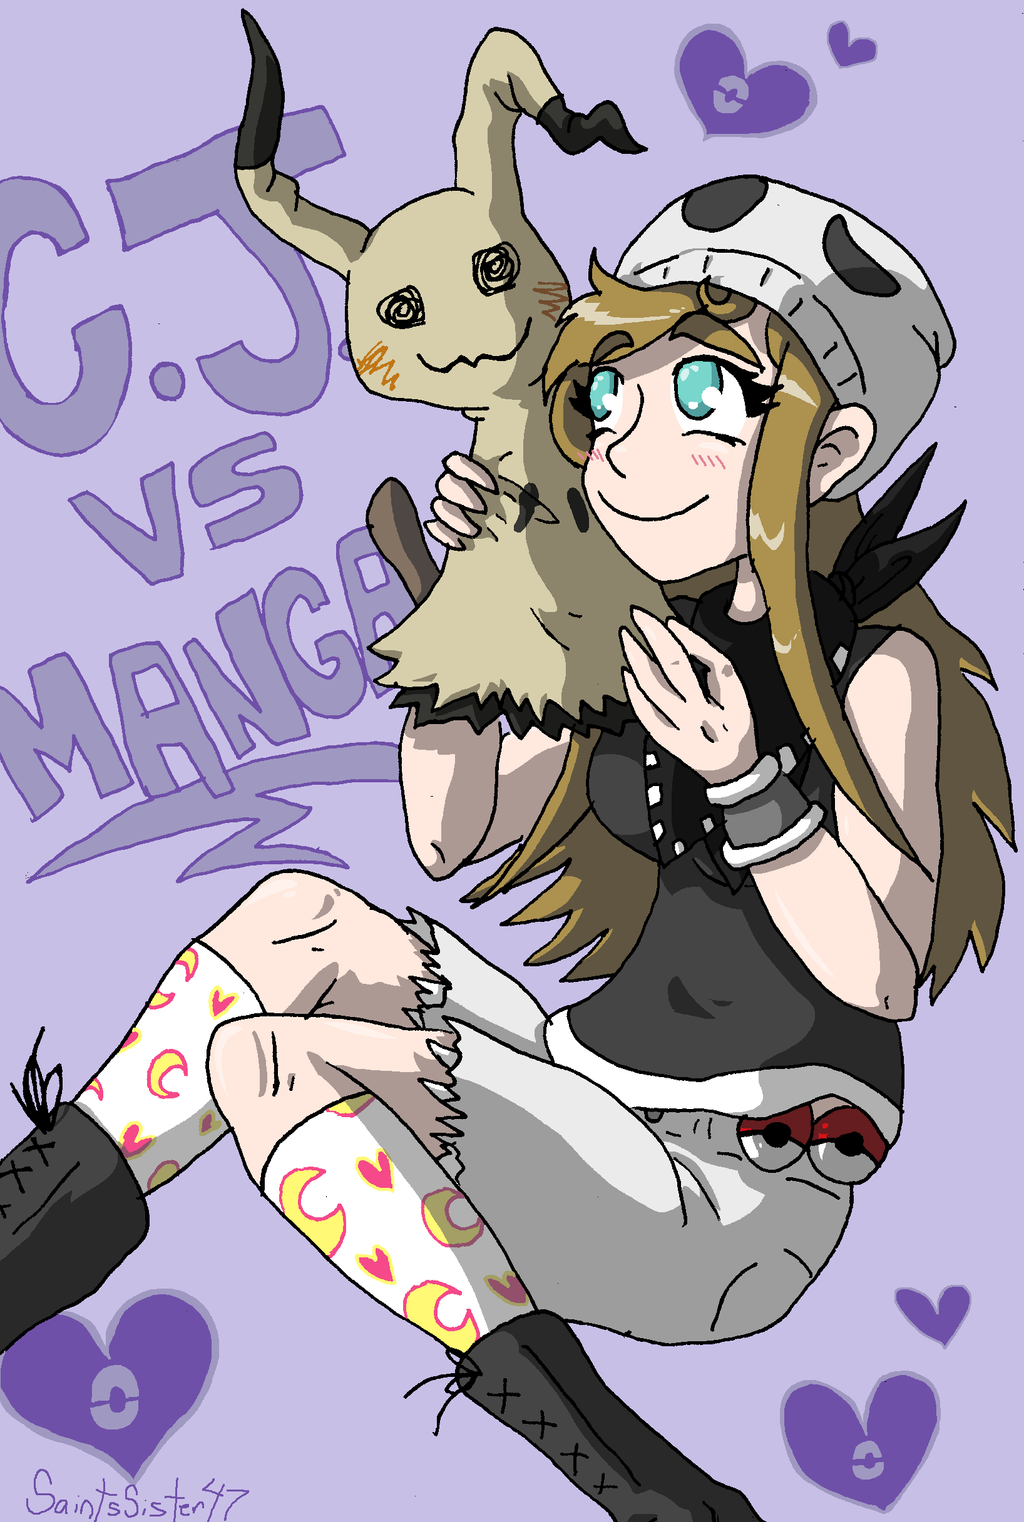 Cj VS Manga by SaintsSister47